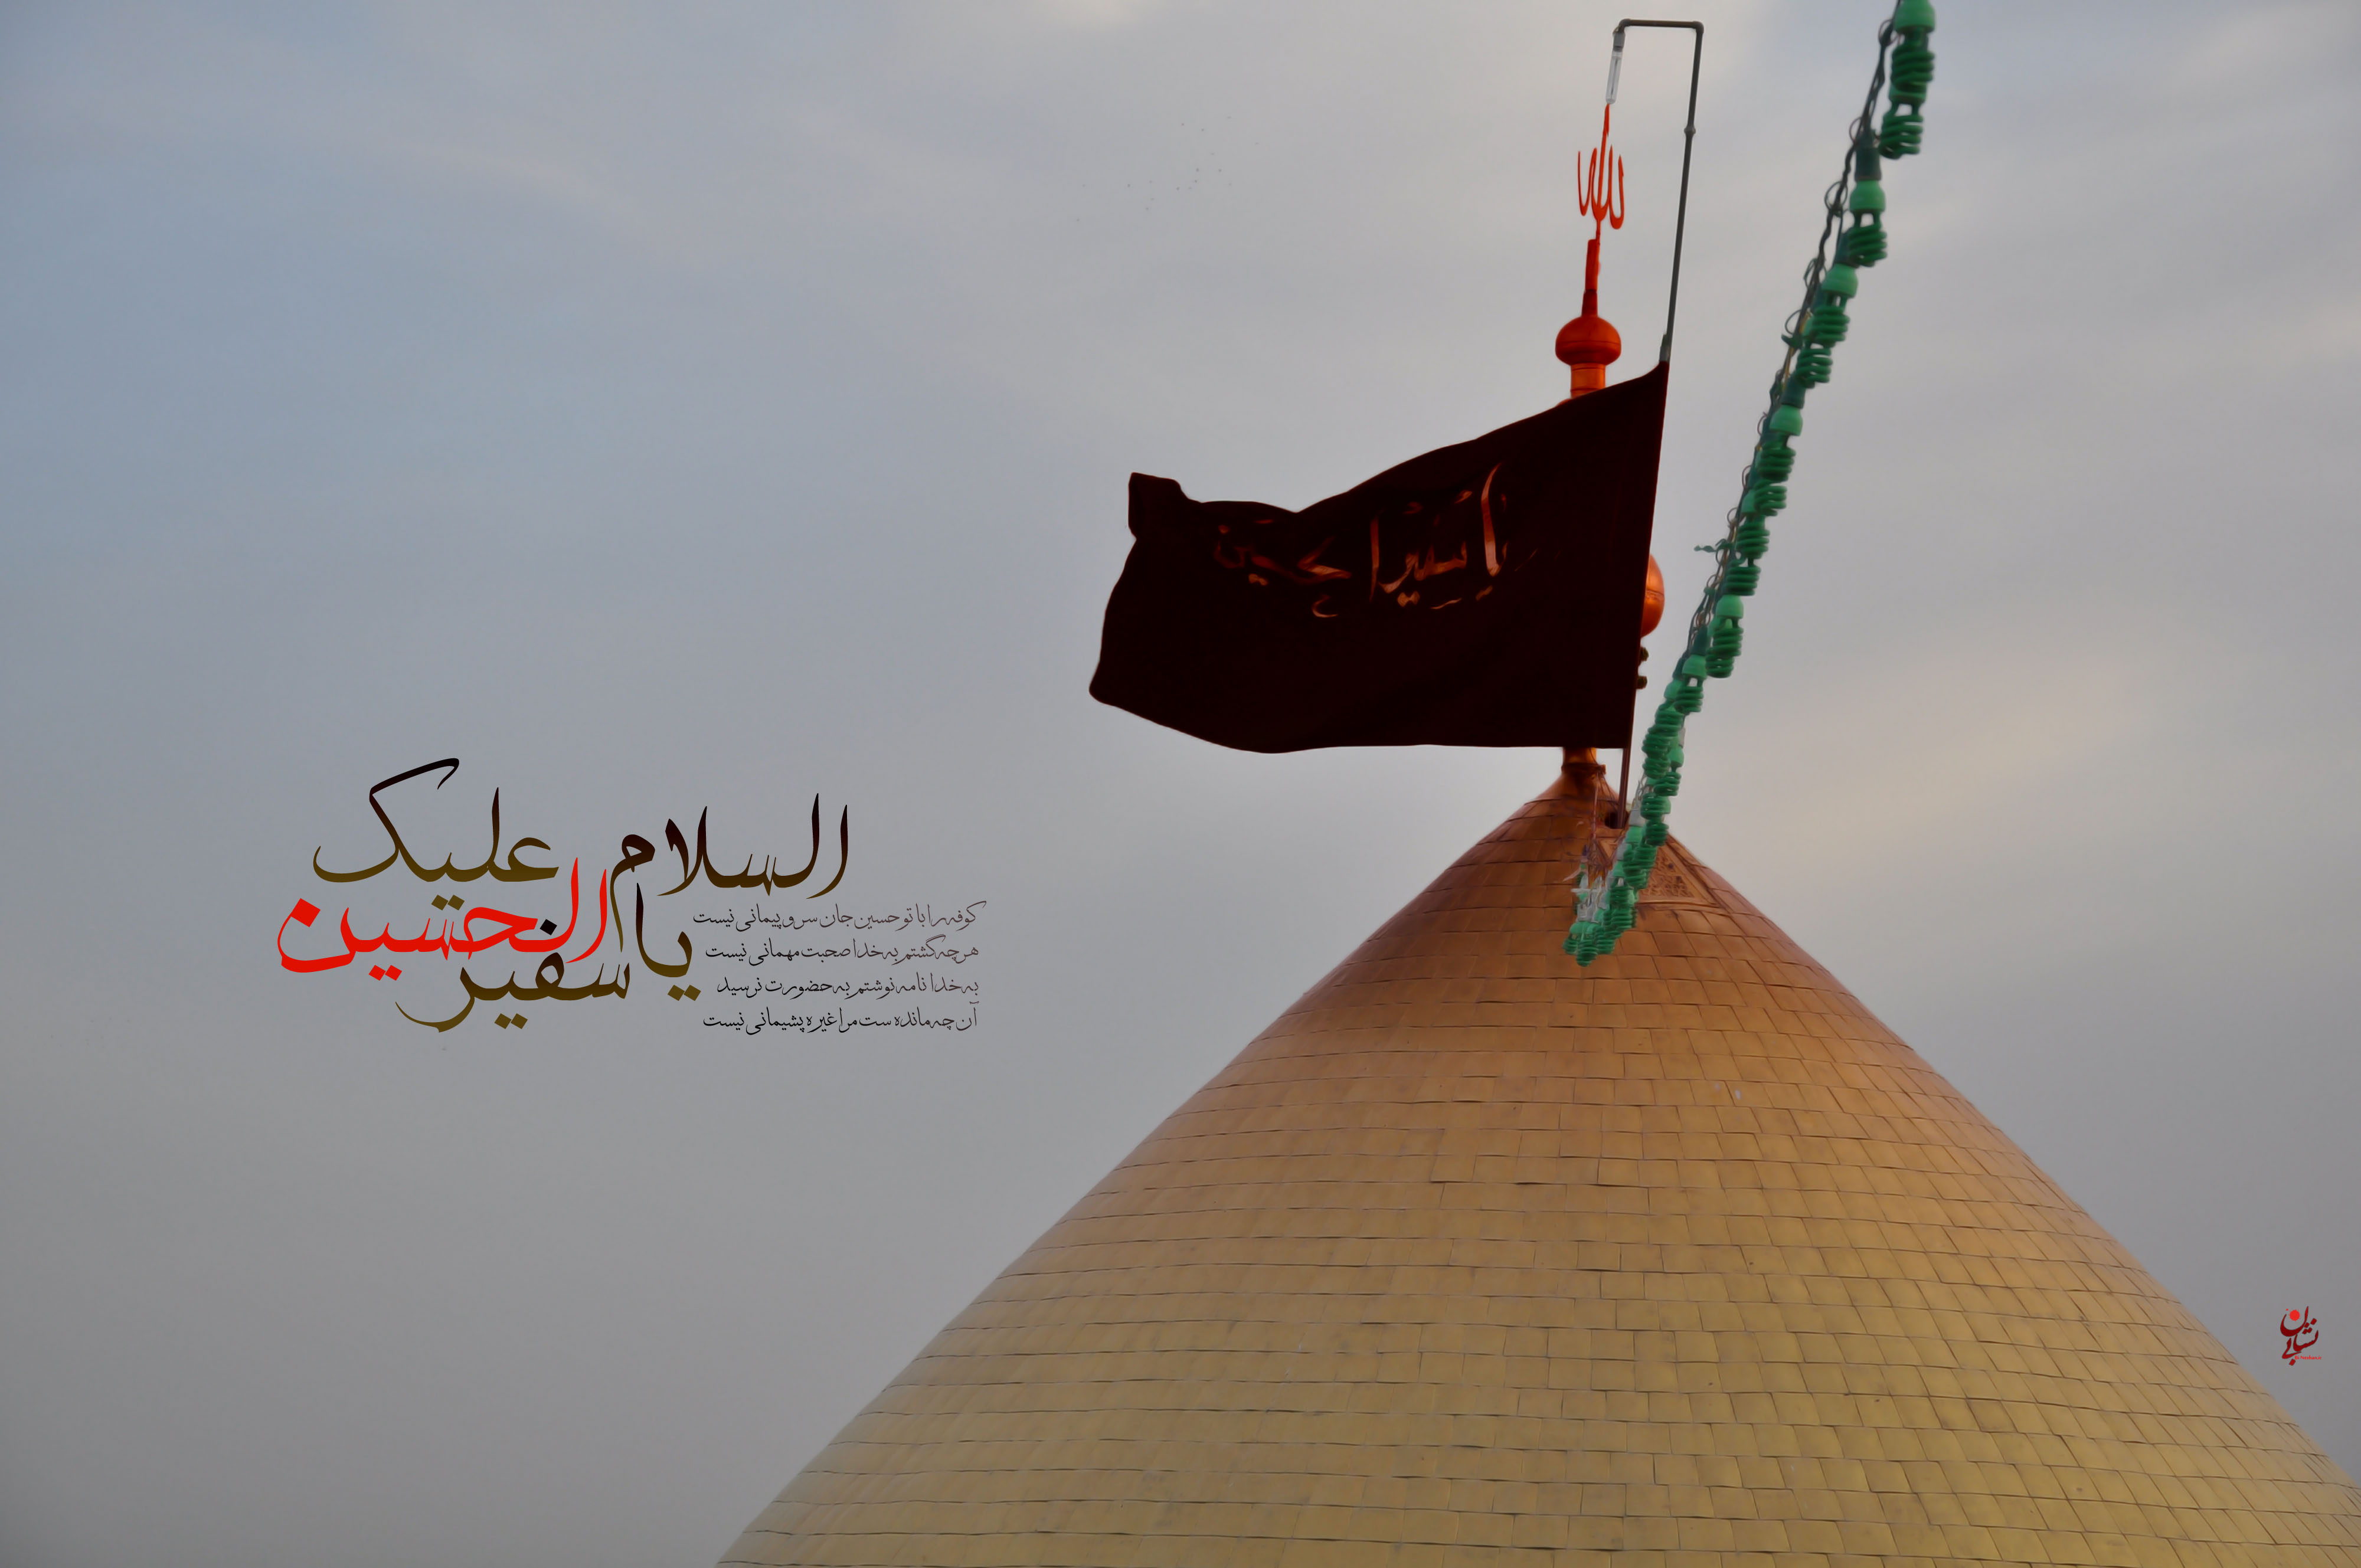 http://bi-neshan.ir/wp-content/uploads/2012/10/H.Moslema-2.jpg